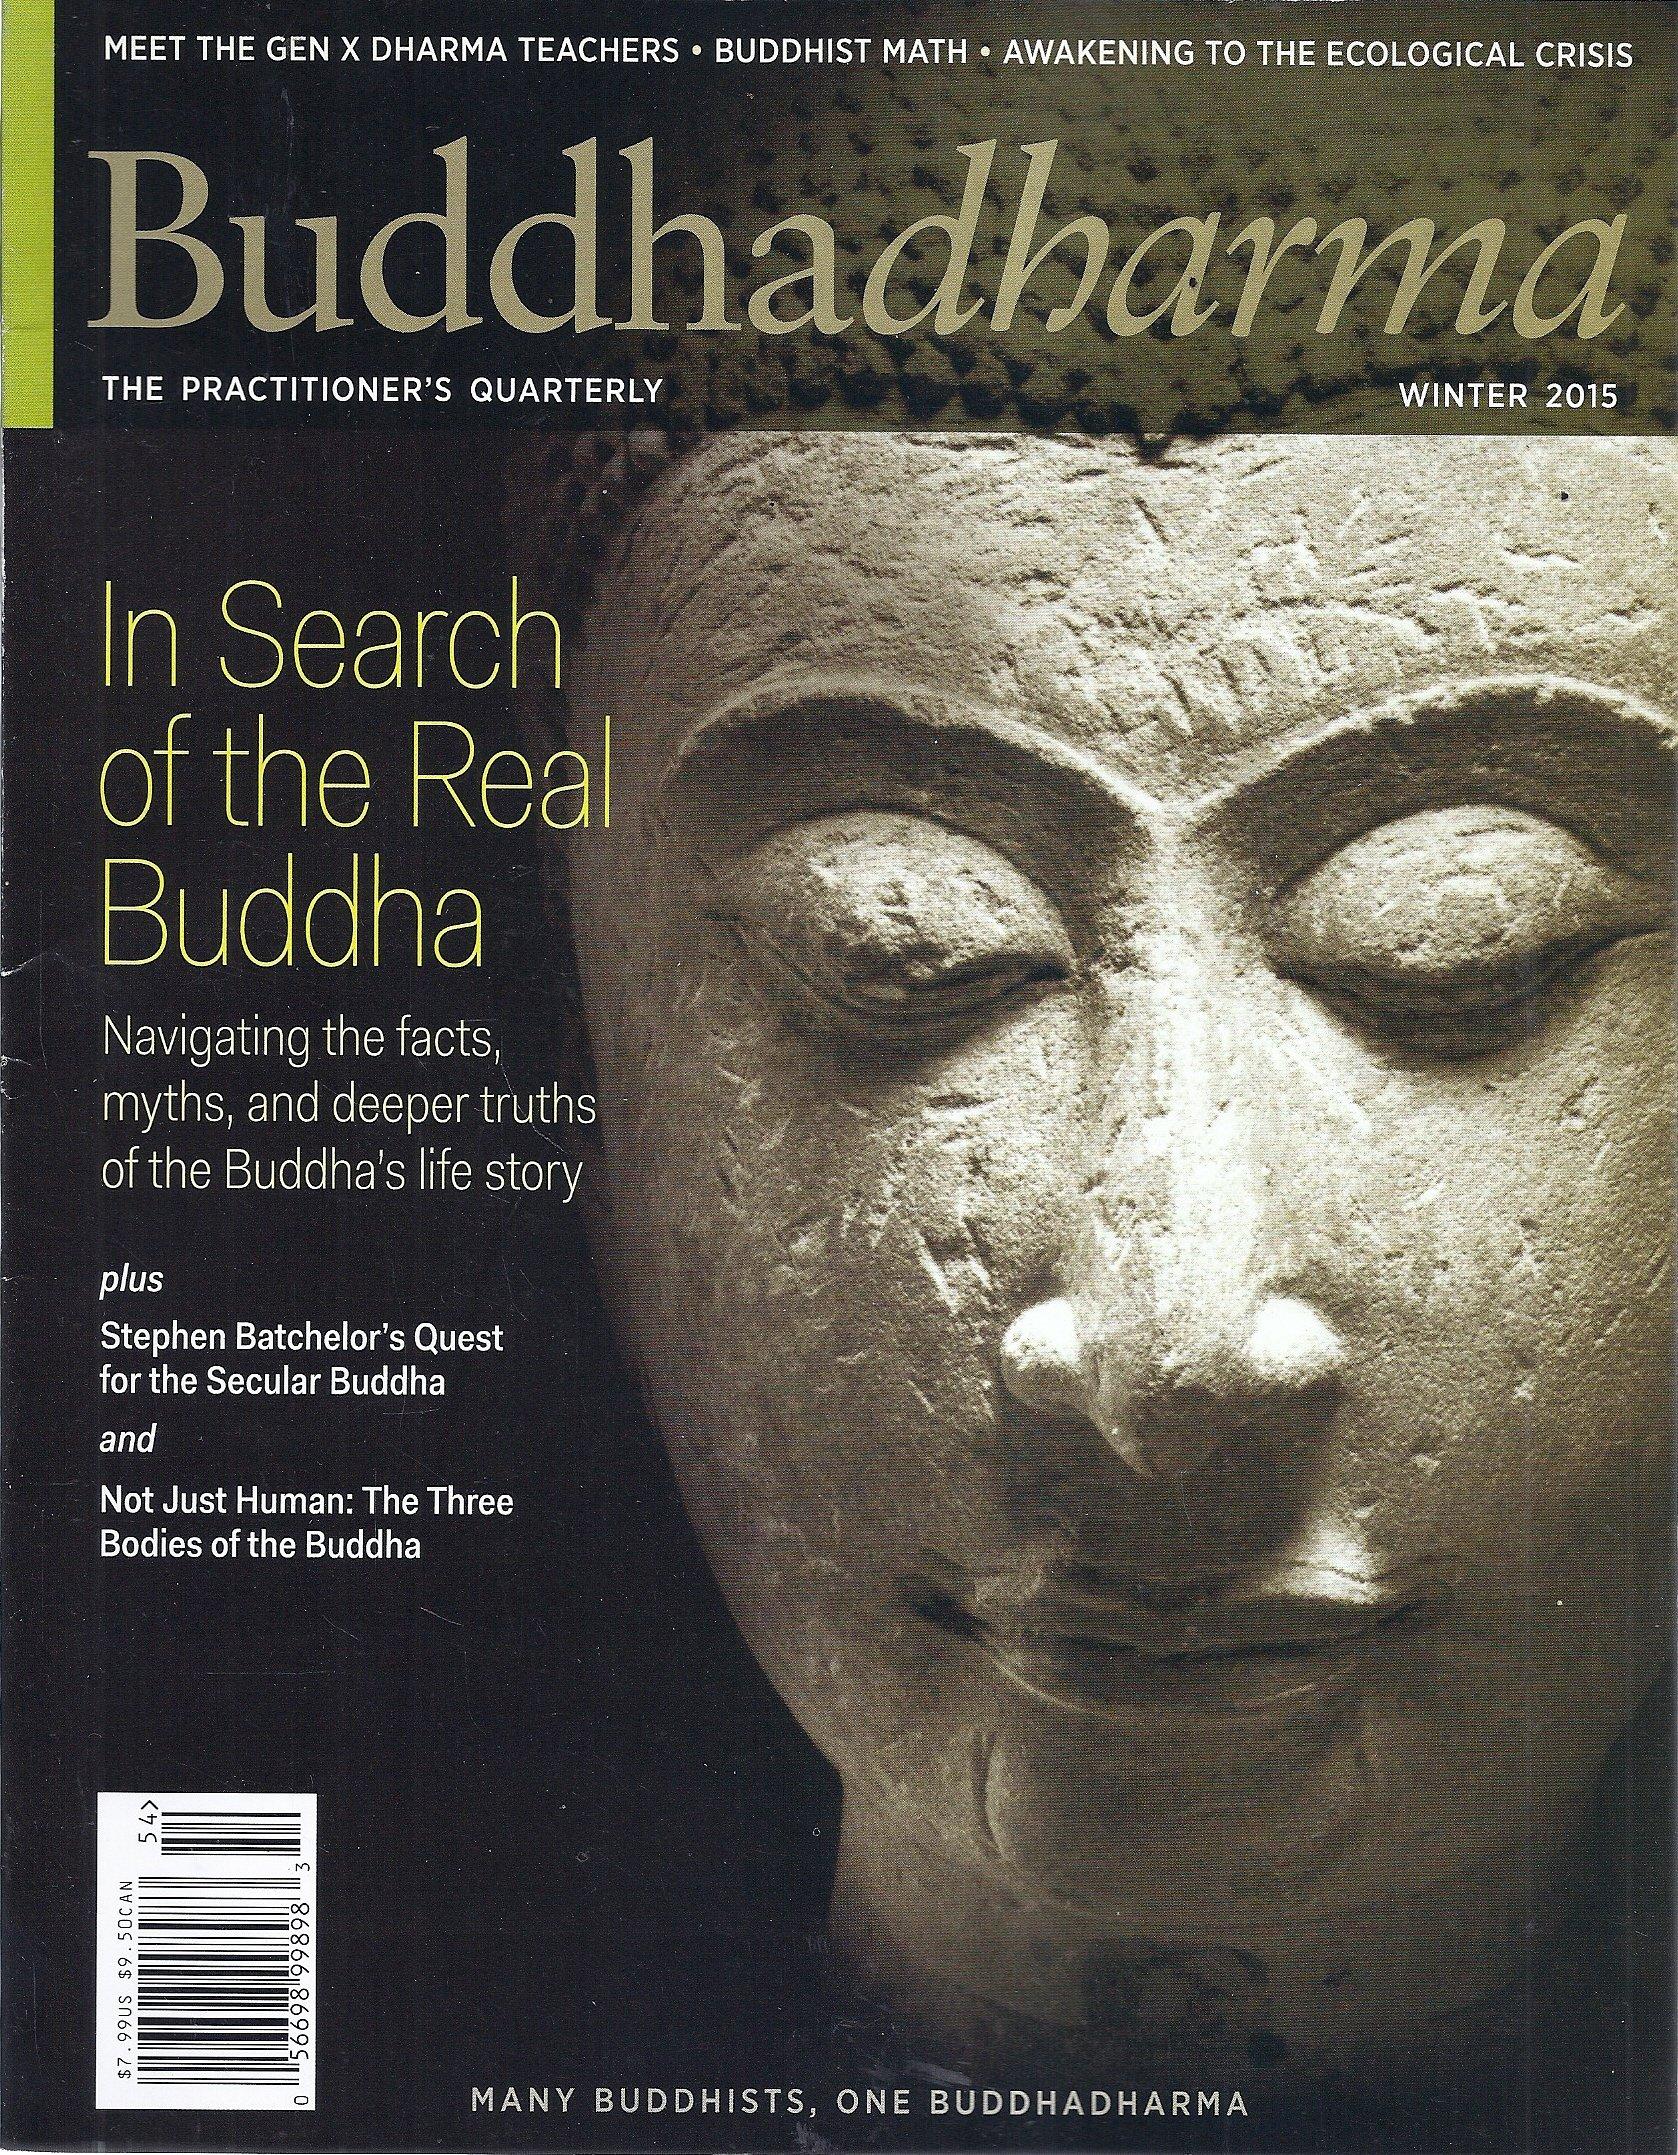 Download Buddhadharma Magazine (Winter 2015 - In Search Of The Real Buddha) ebook